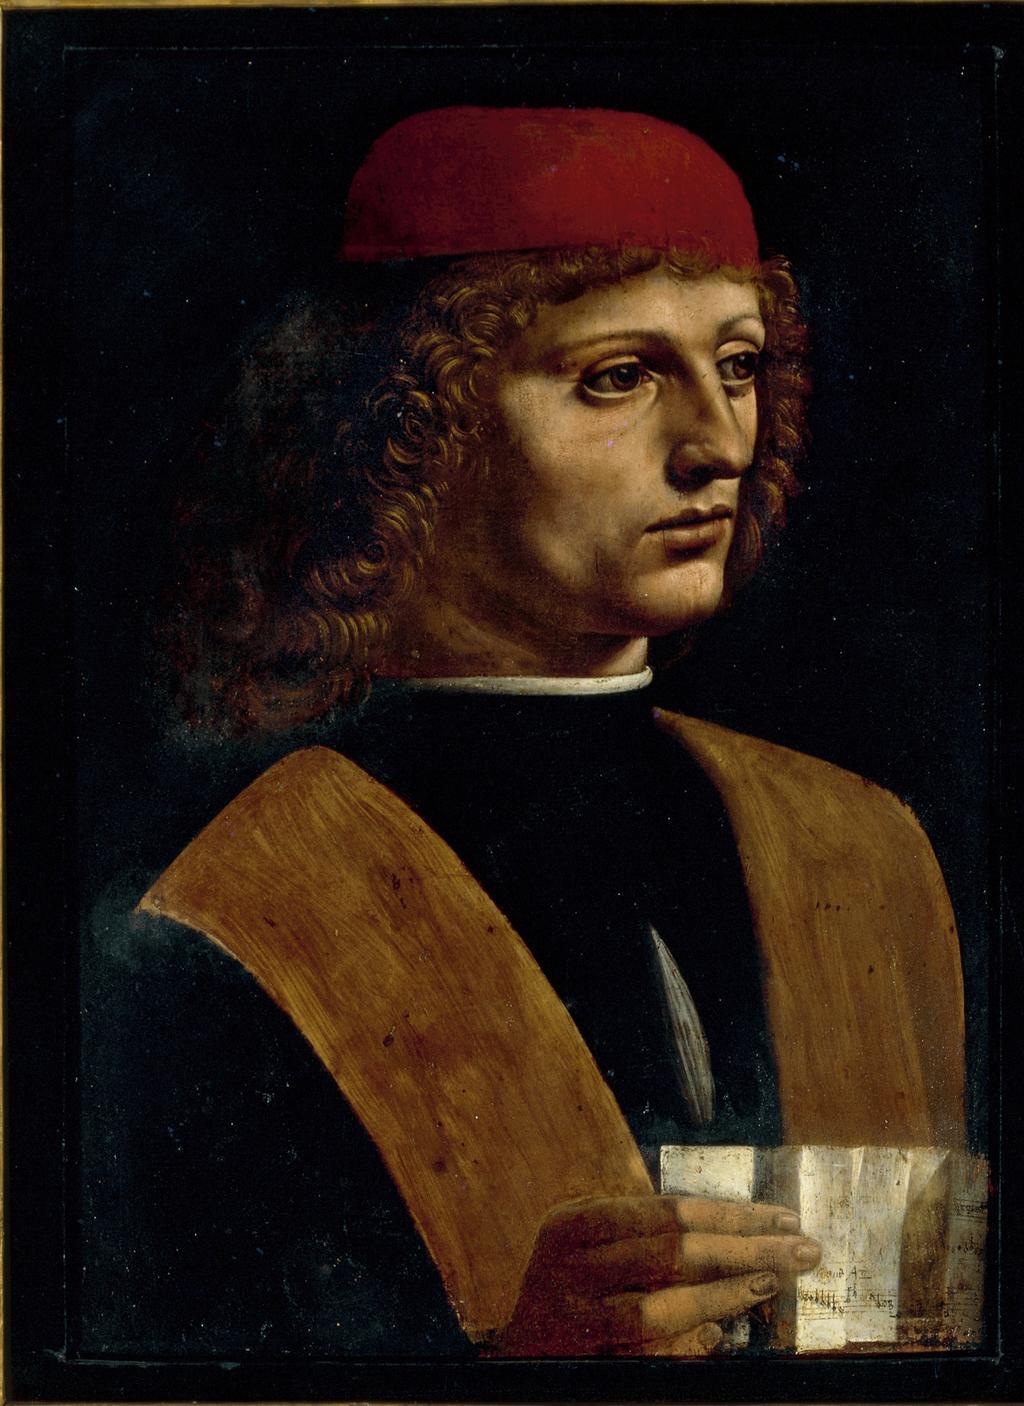 Portrét hudebníka